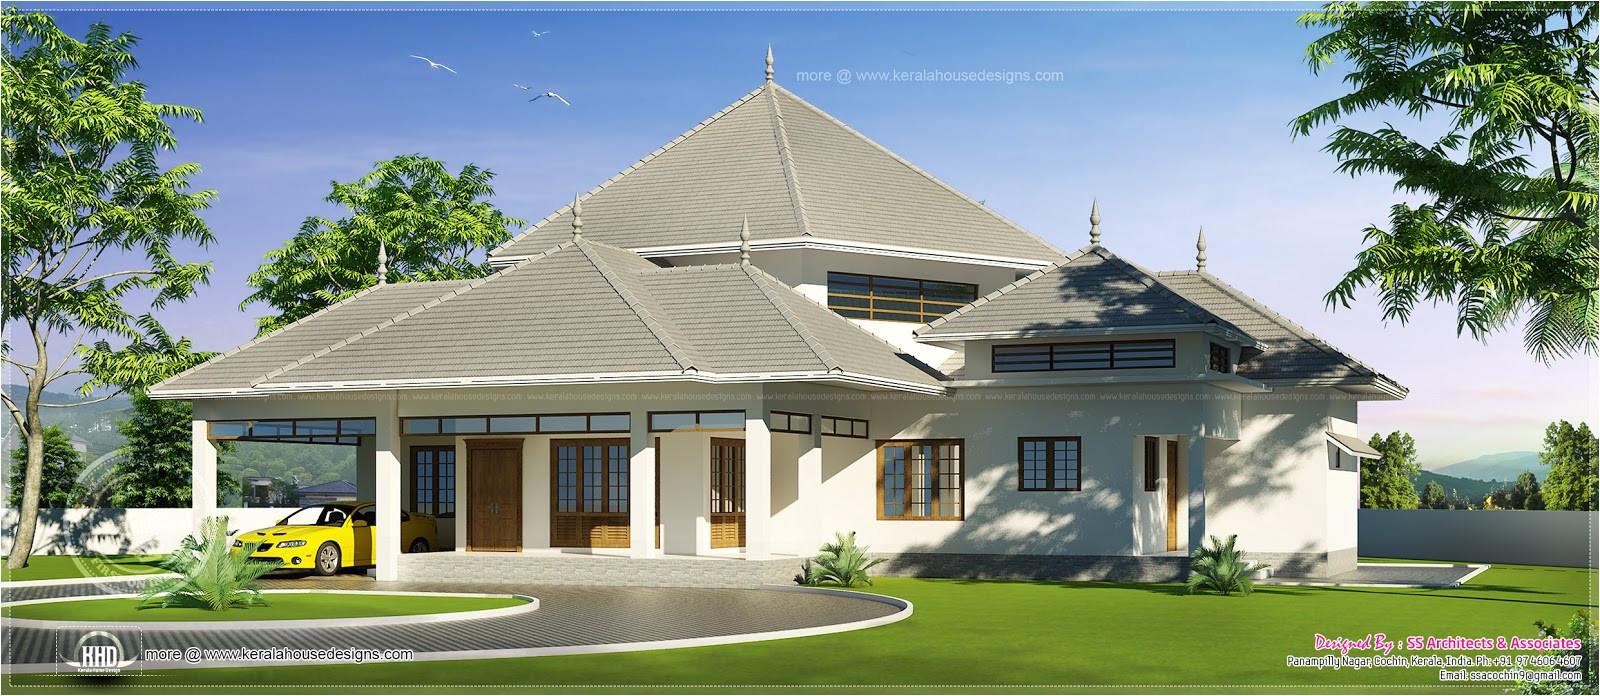 kerala style single storey feet home design house plans 58459 2